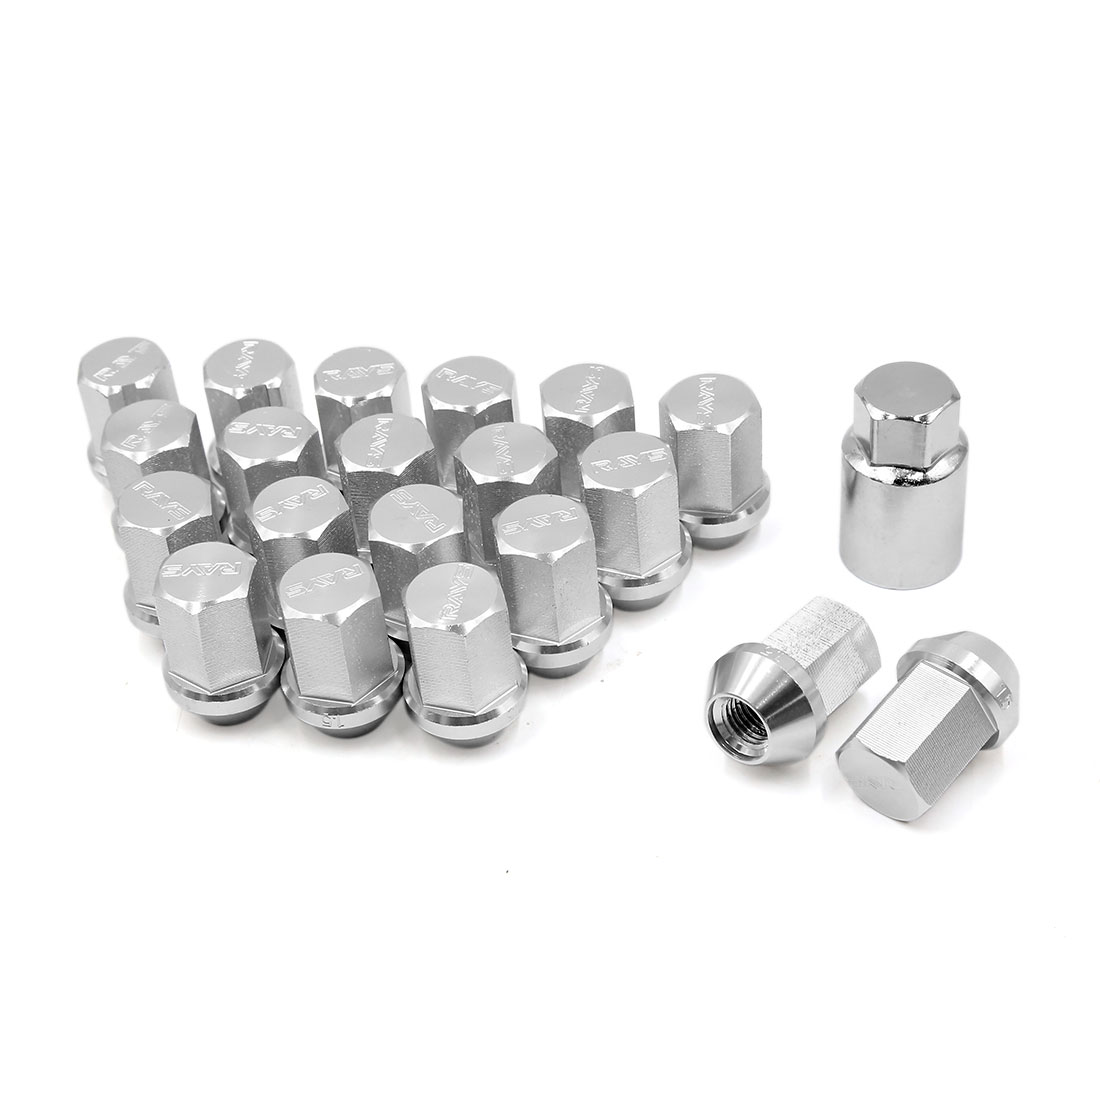 20Pcs Silver Tone Hex Security Lock Wheel Lug Nuts M12 x 1.25 Screw for Auto Car